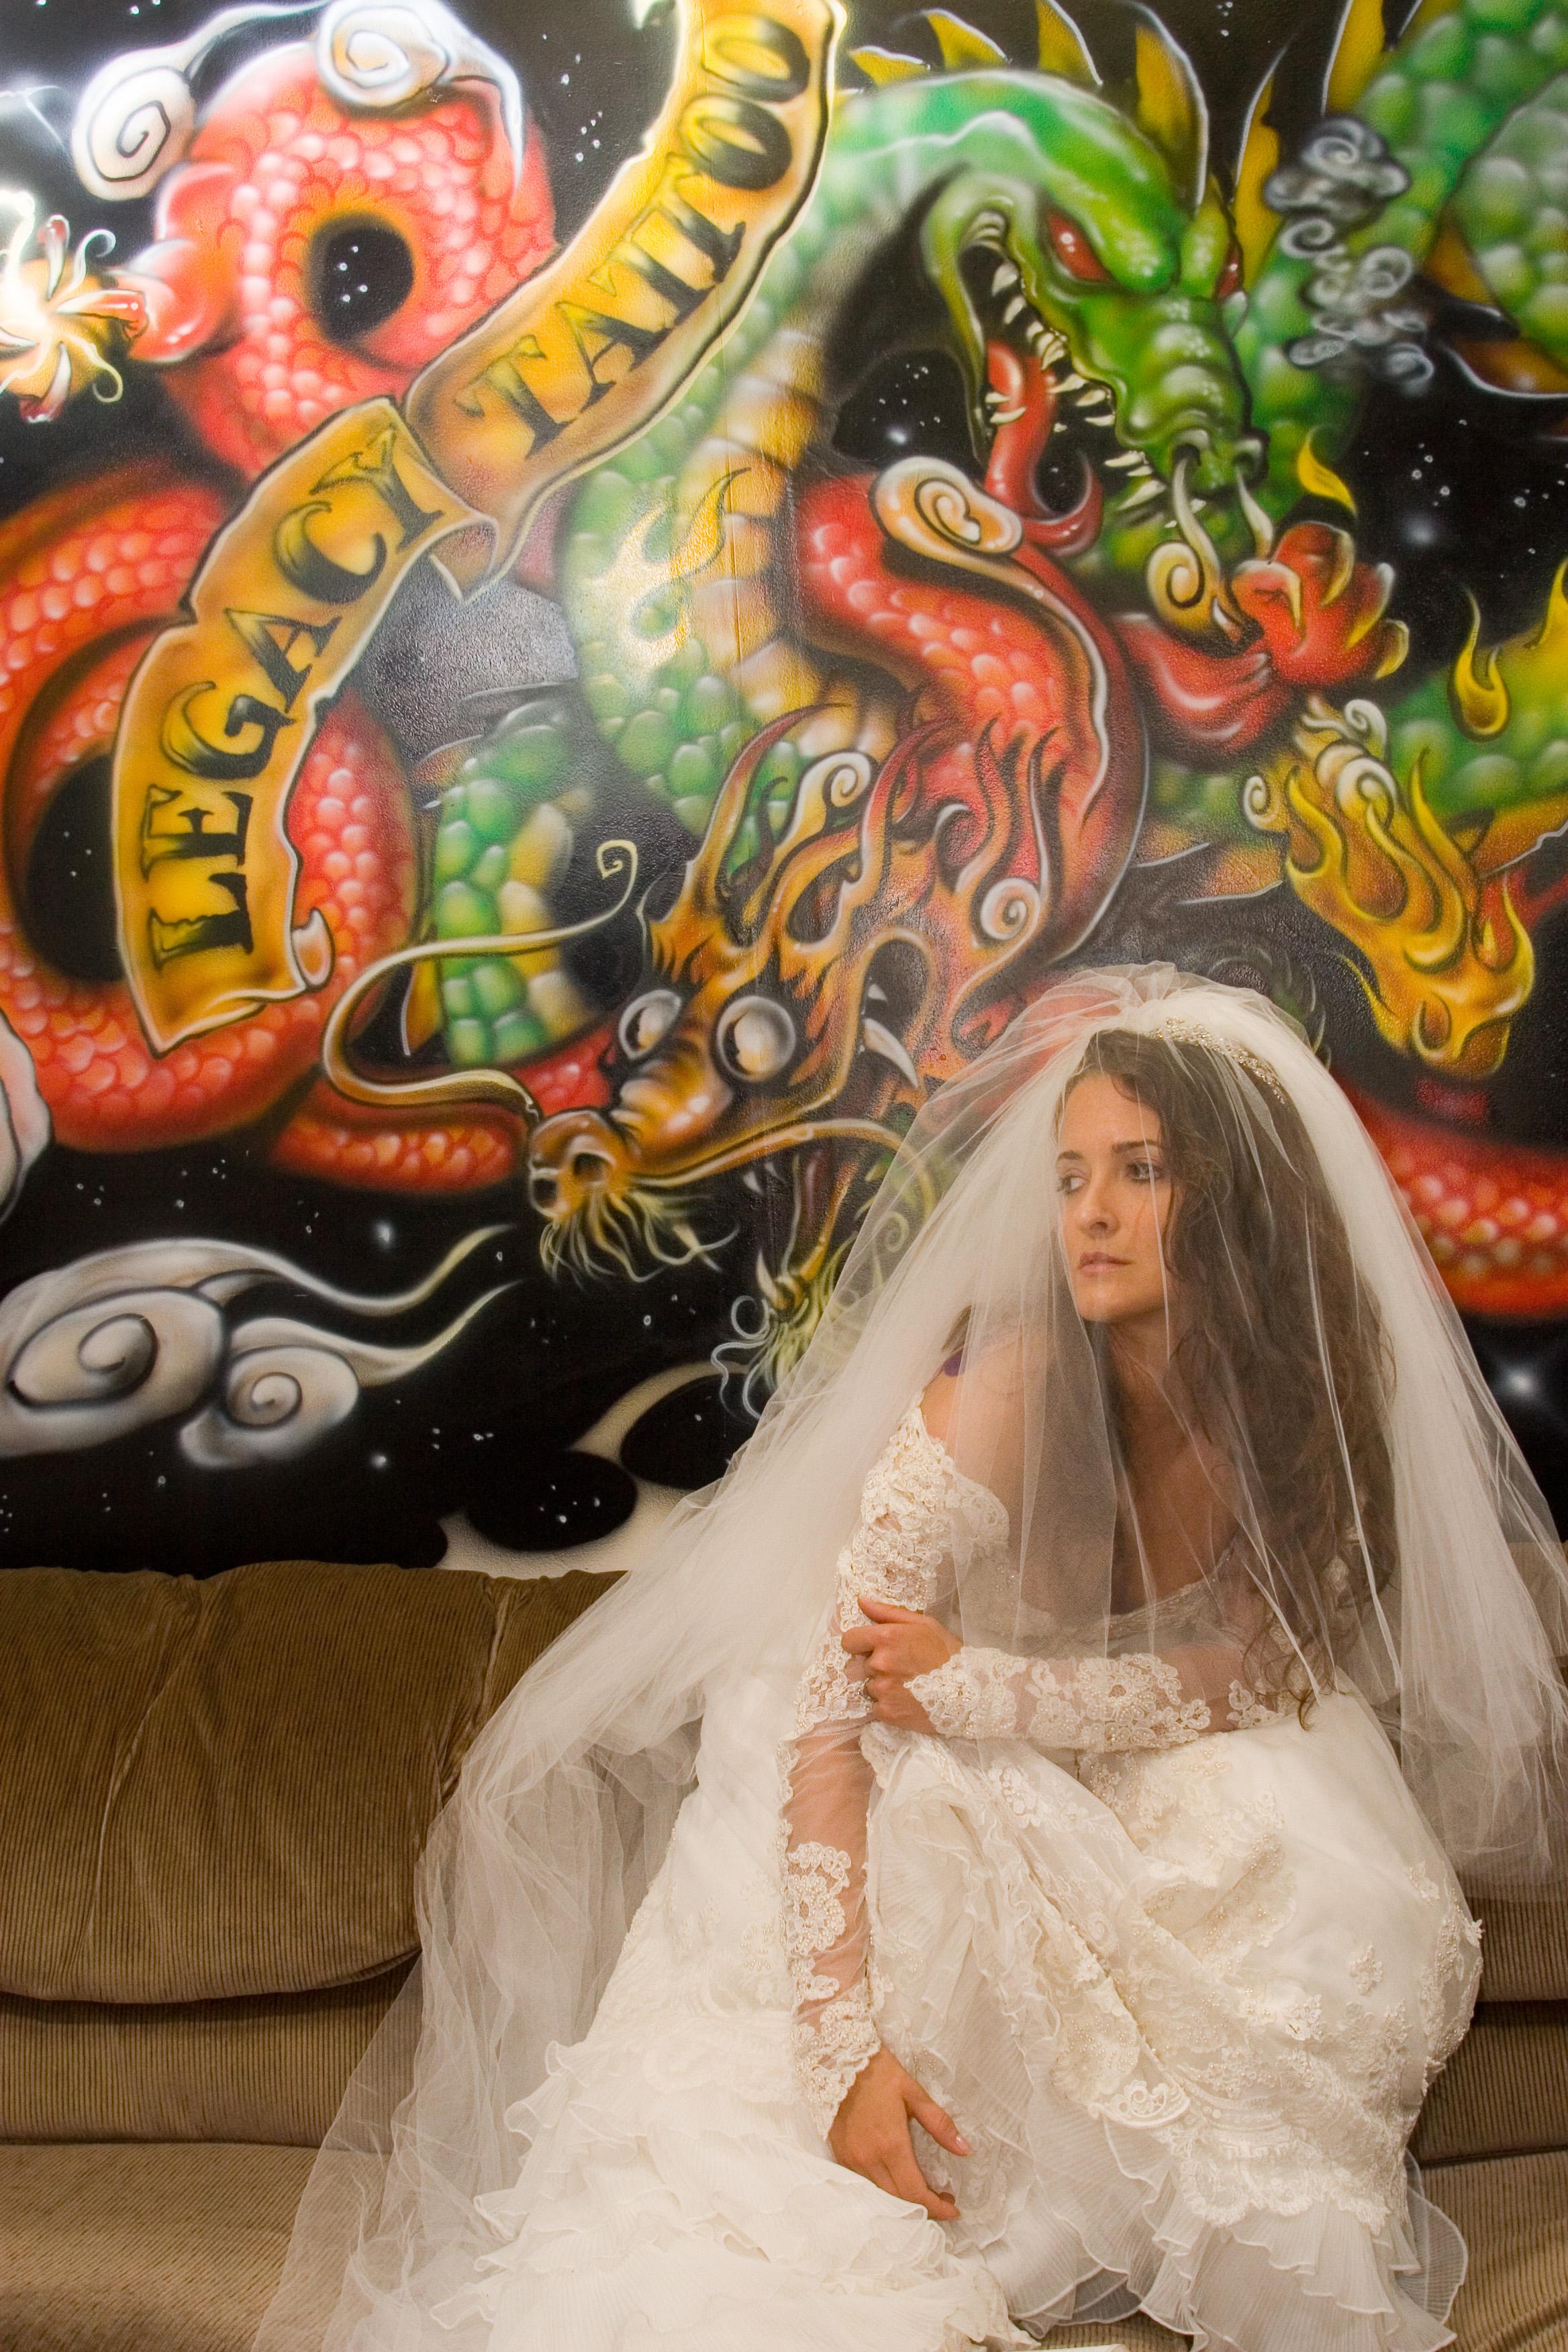 Kathleen Davison - Love's Letters Lost promo shoot